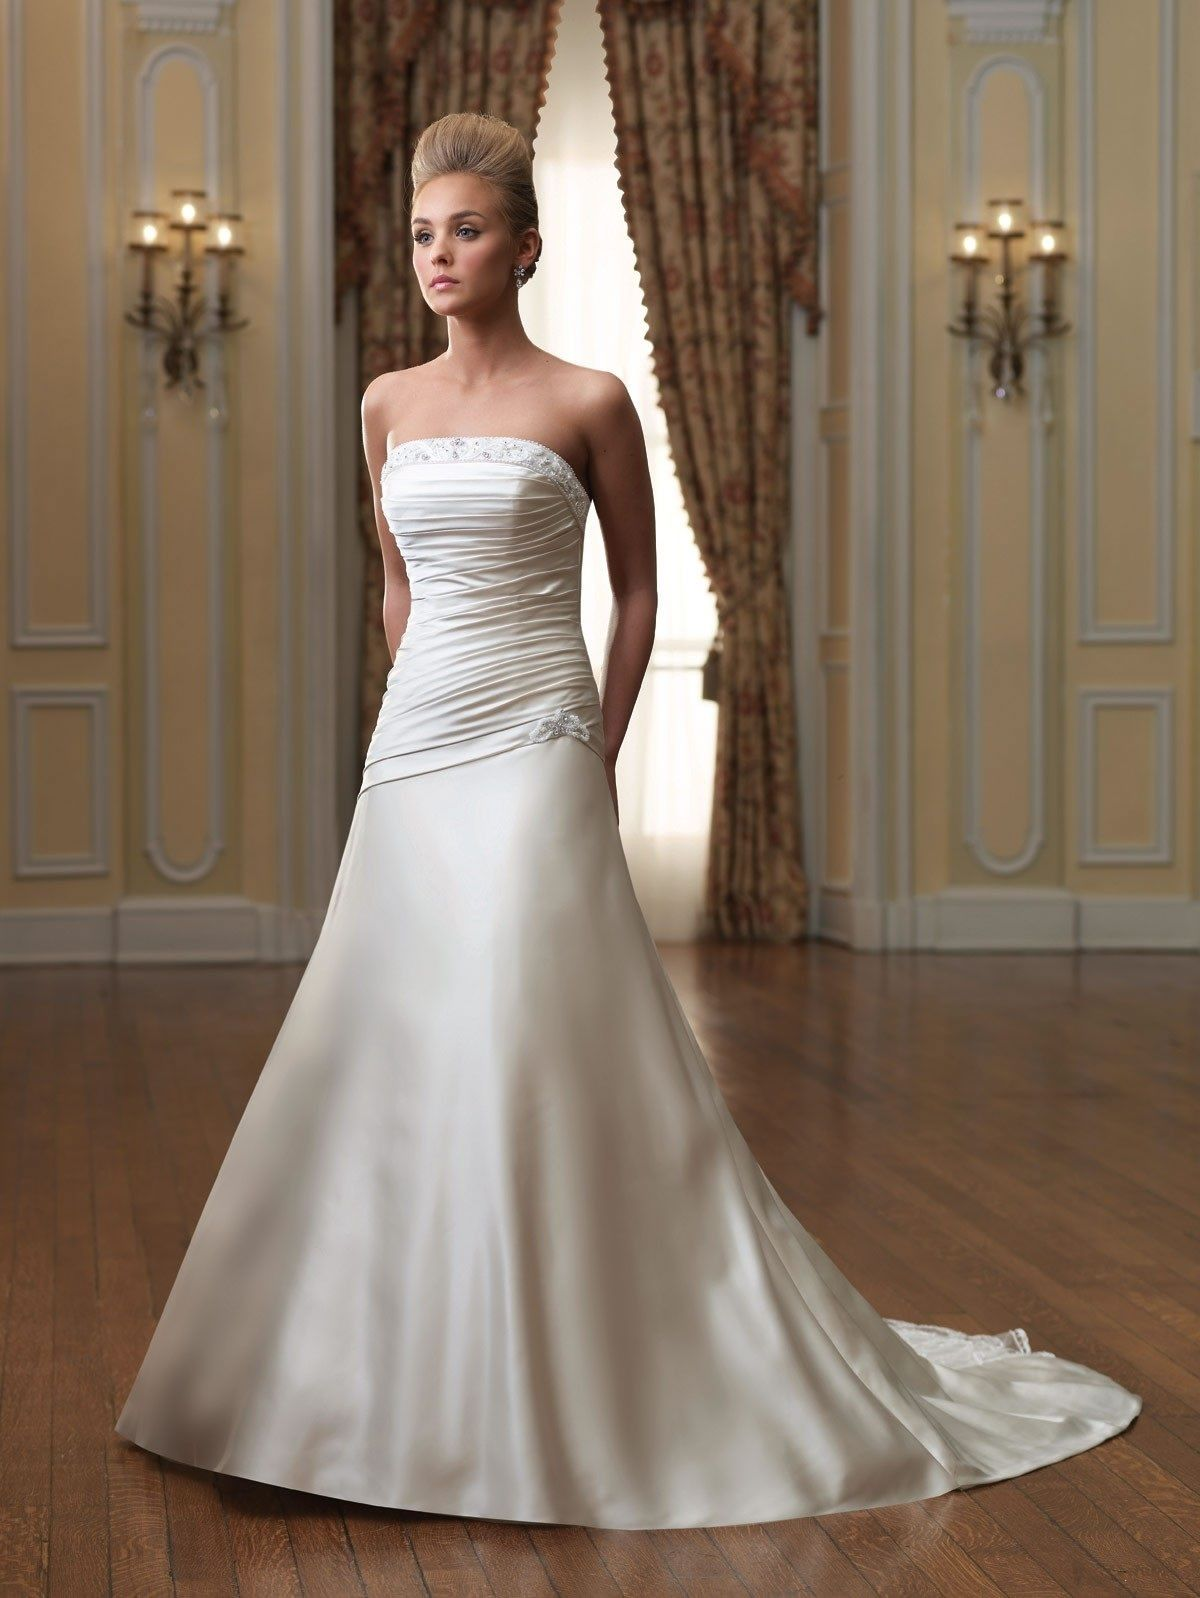 Wedding dress style weddingprinterweddingdress